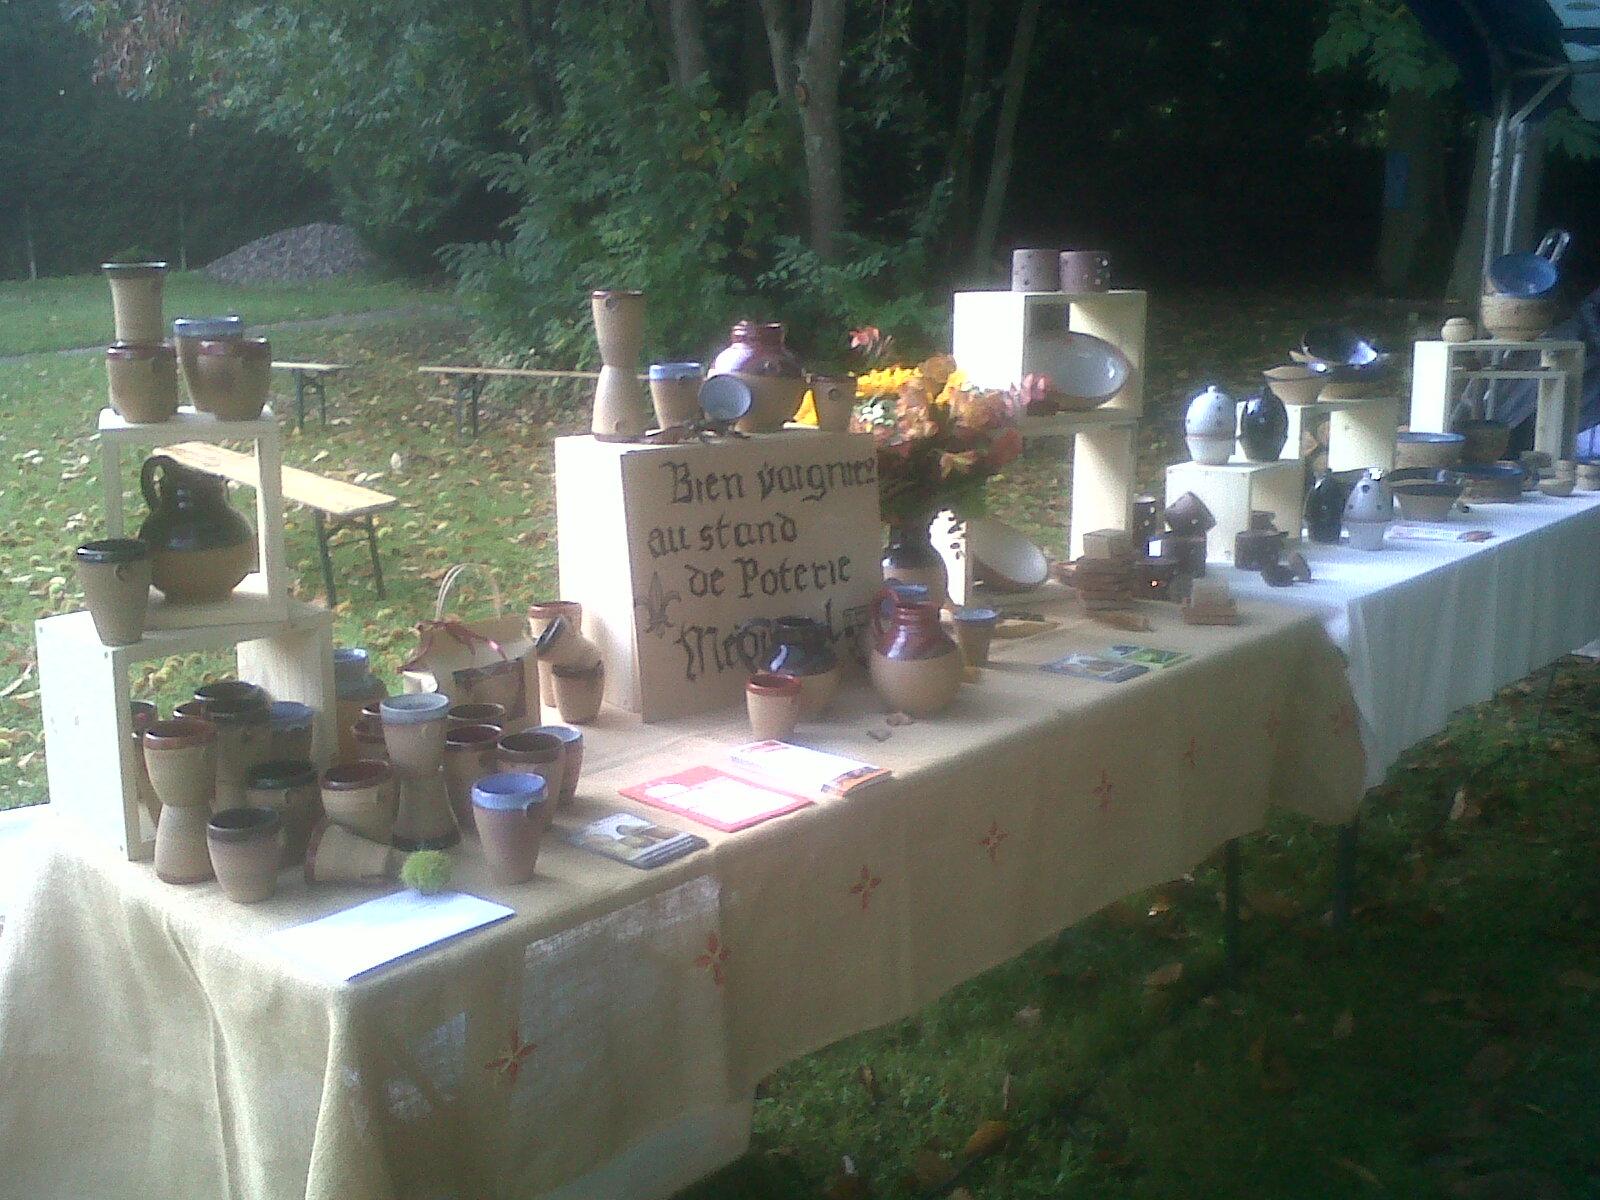 Stand de poterie Médiévale